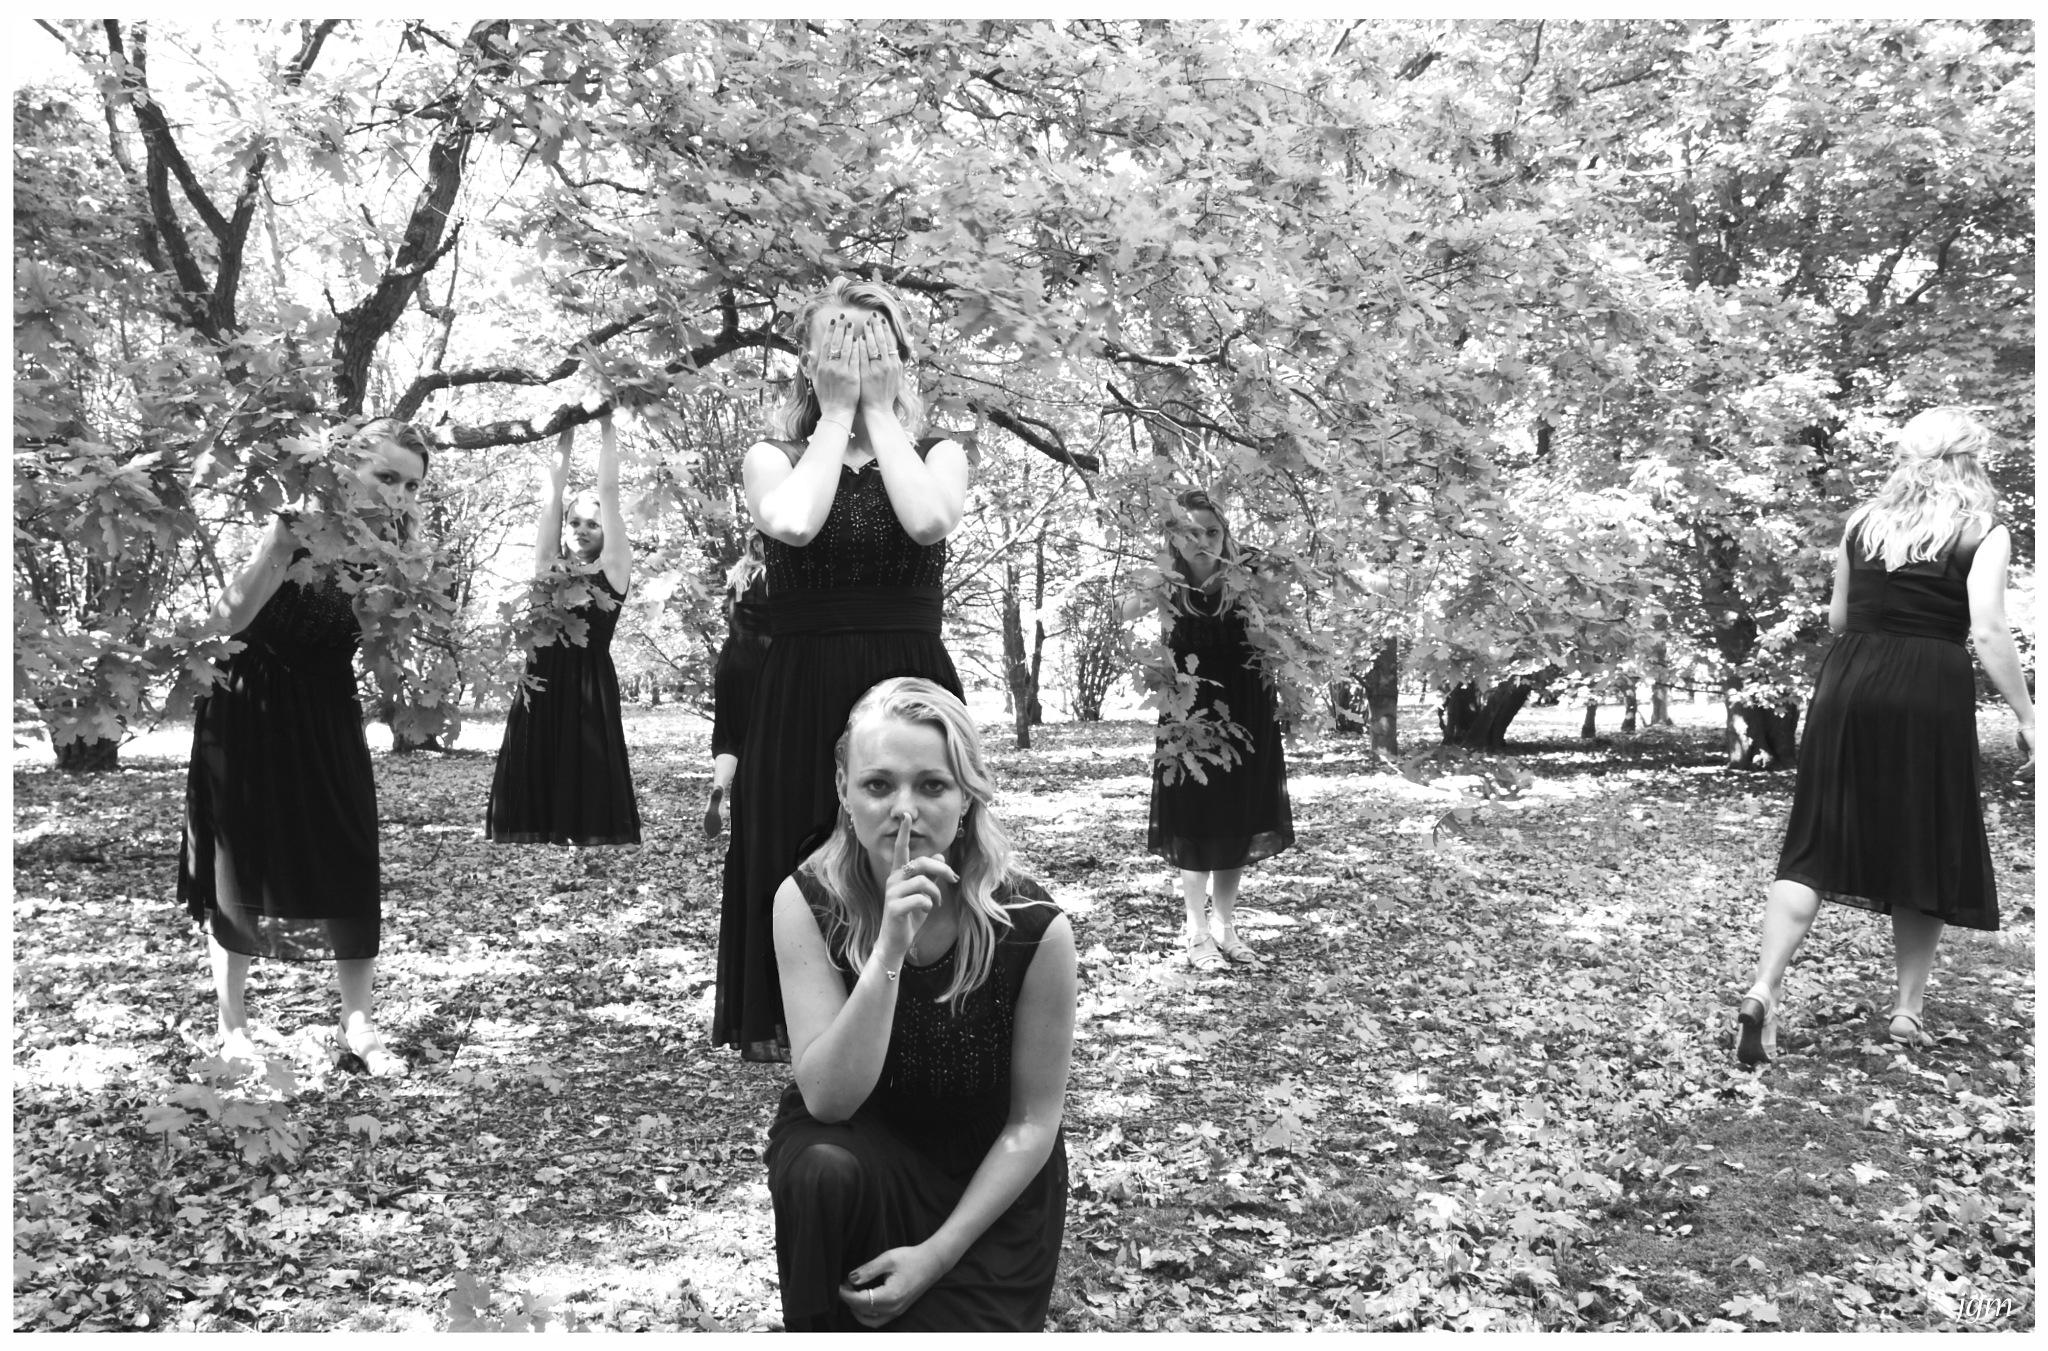 Sisters in the wood by Jan Machielsen